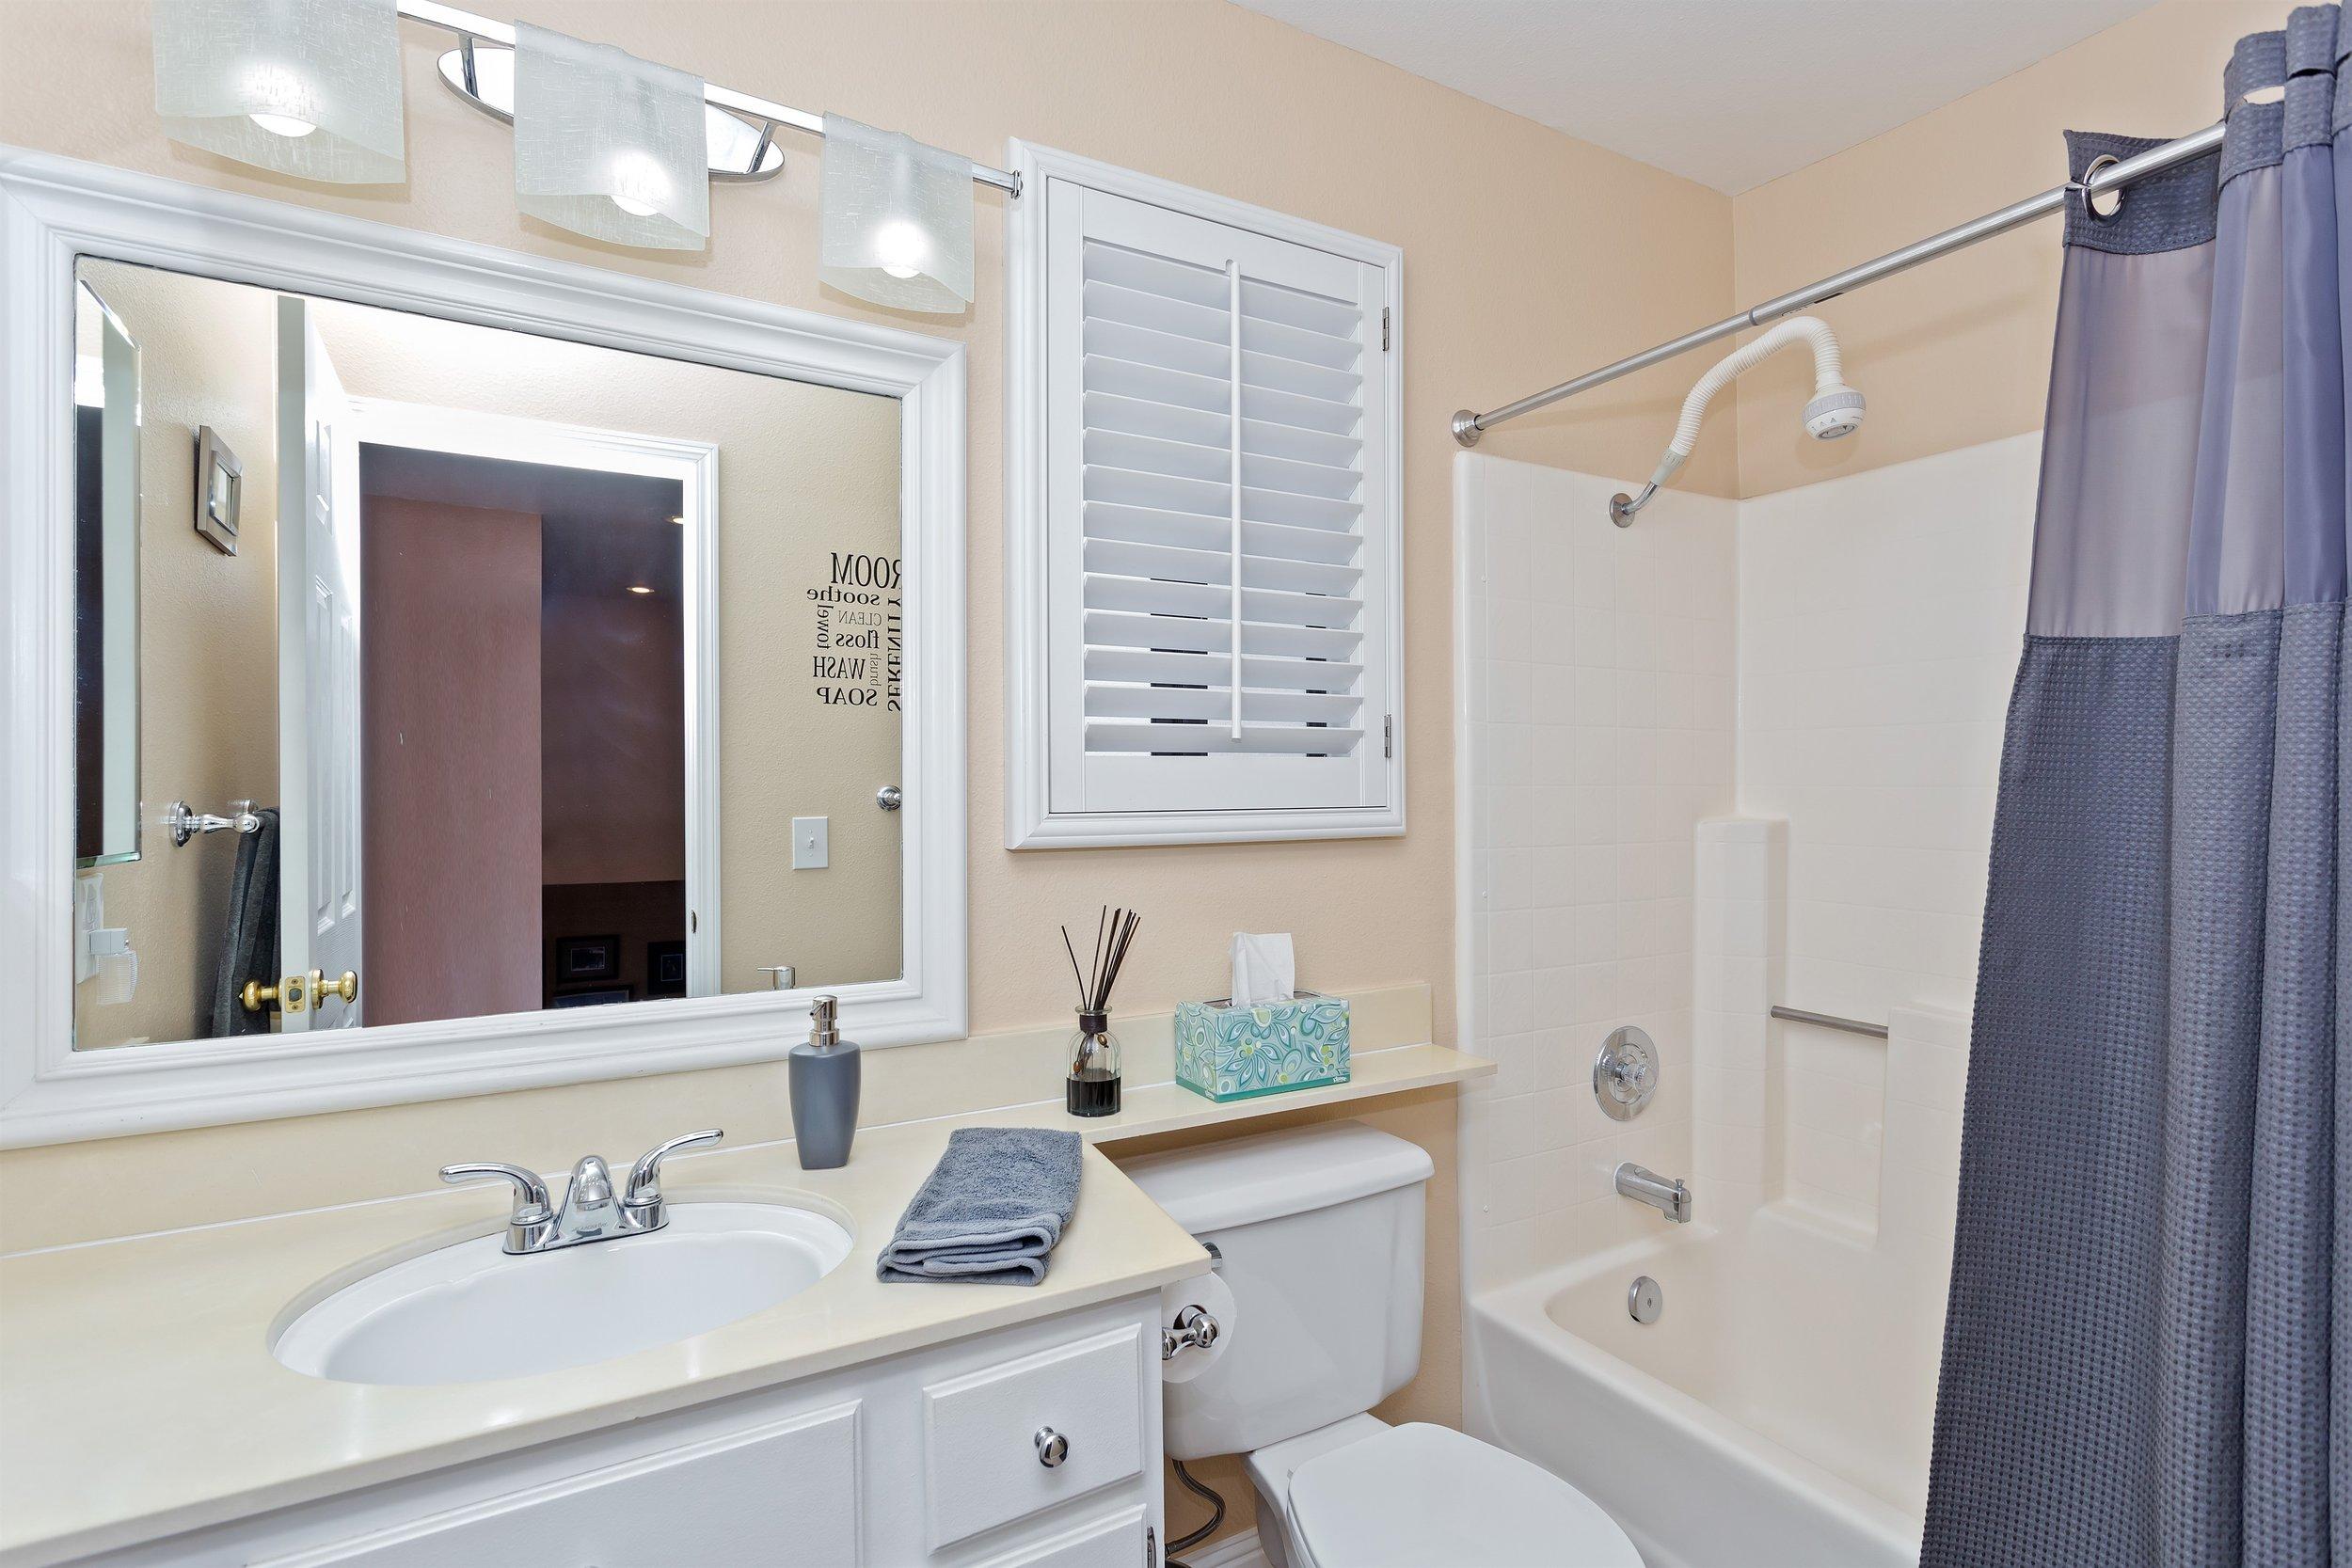 020_2nd Floor Bathroom.jpg